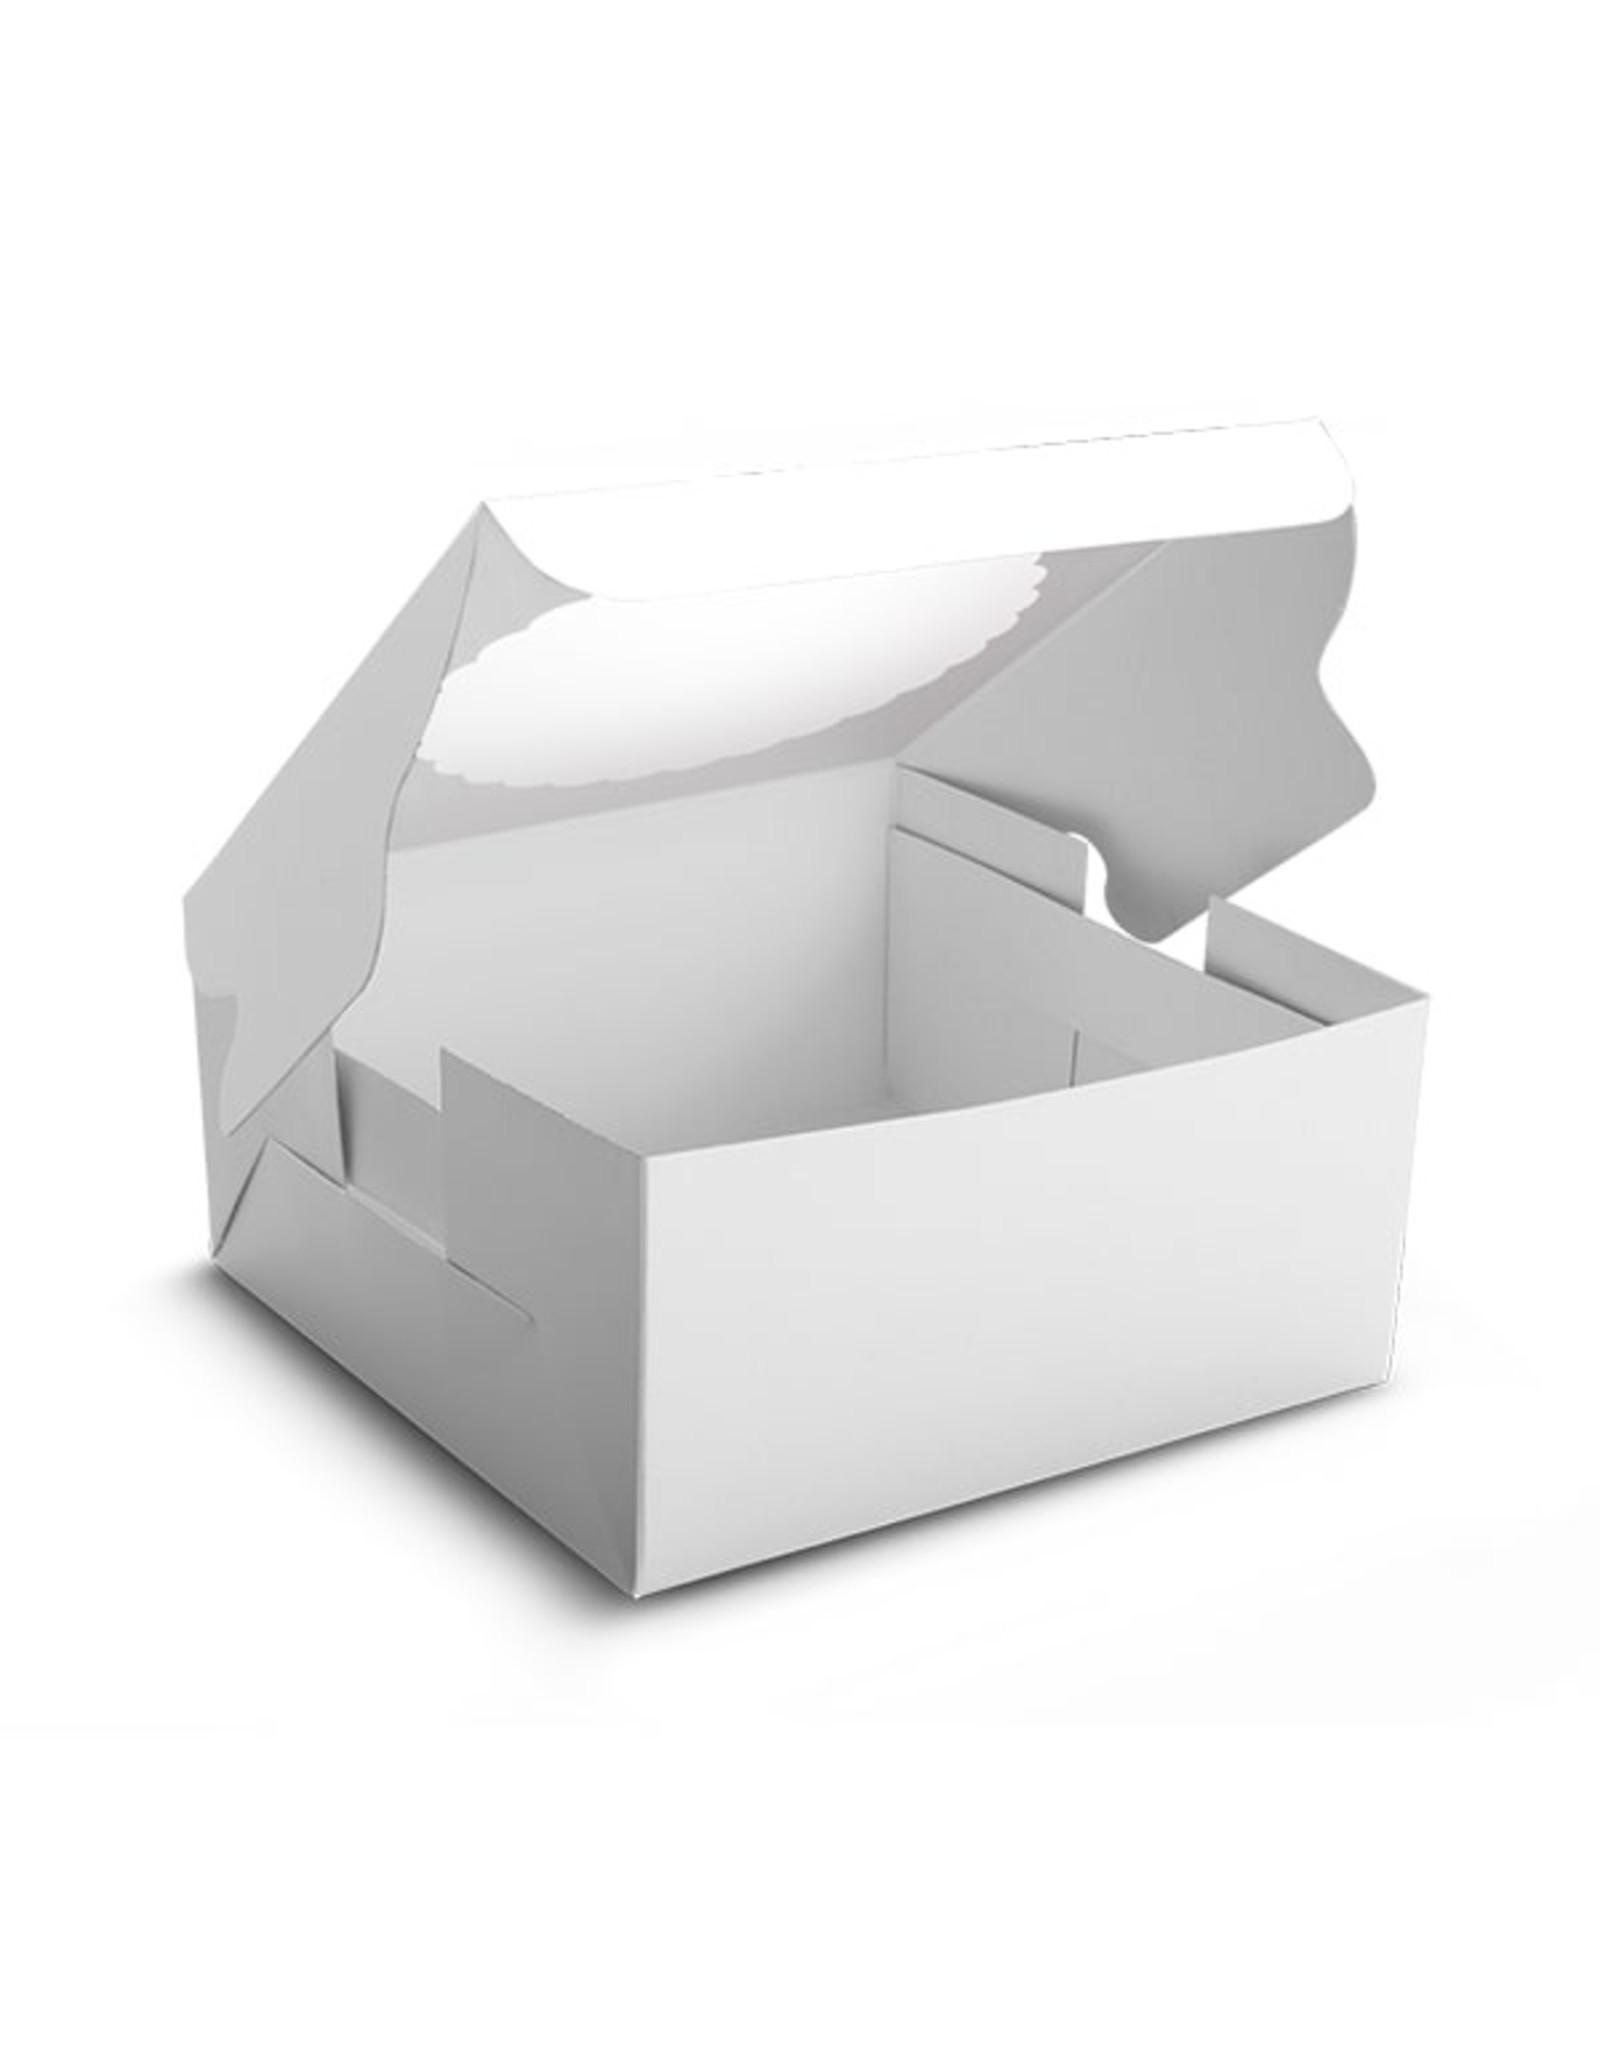 White window cake box - 203 x 203 x 127 mm (per 10 pieces)